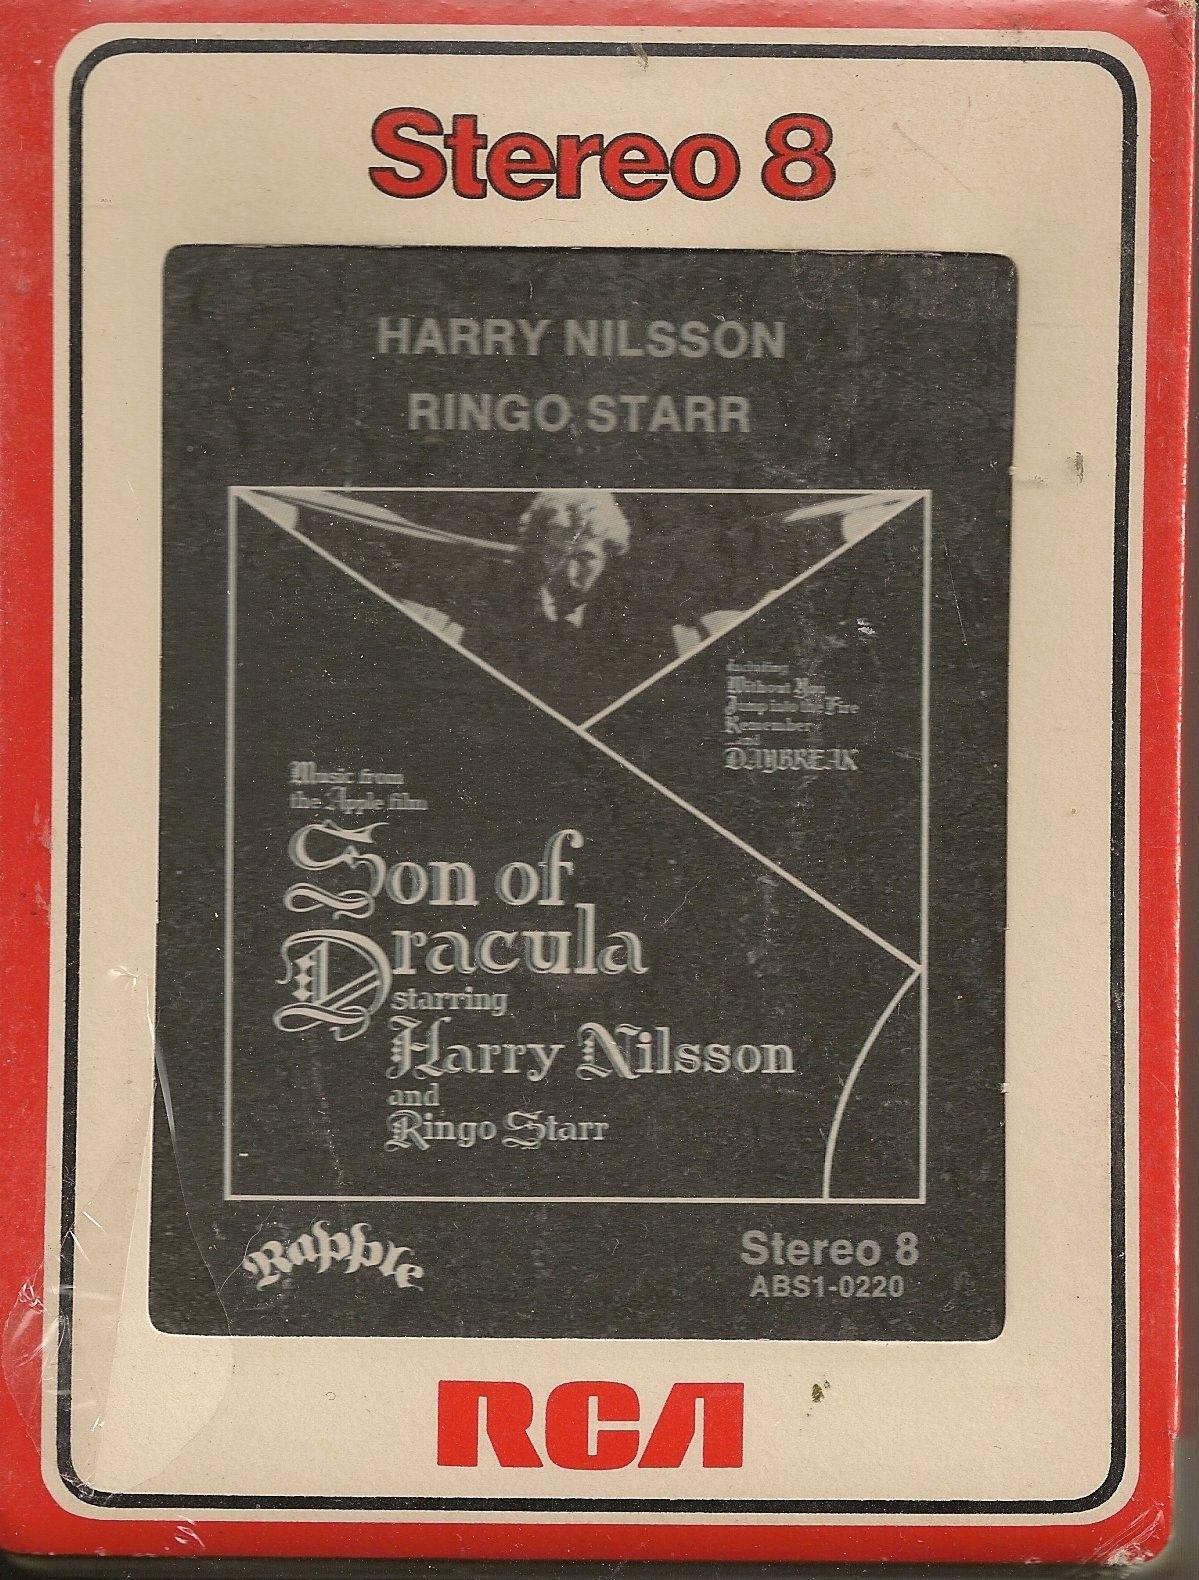 8track tape 8 track tapes, Ringo starr, Harry nilsson